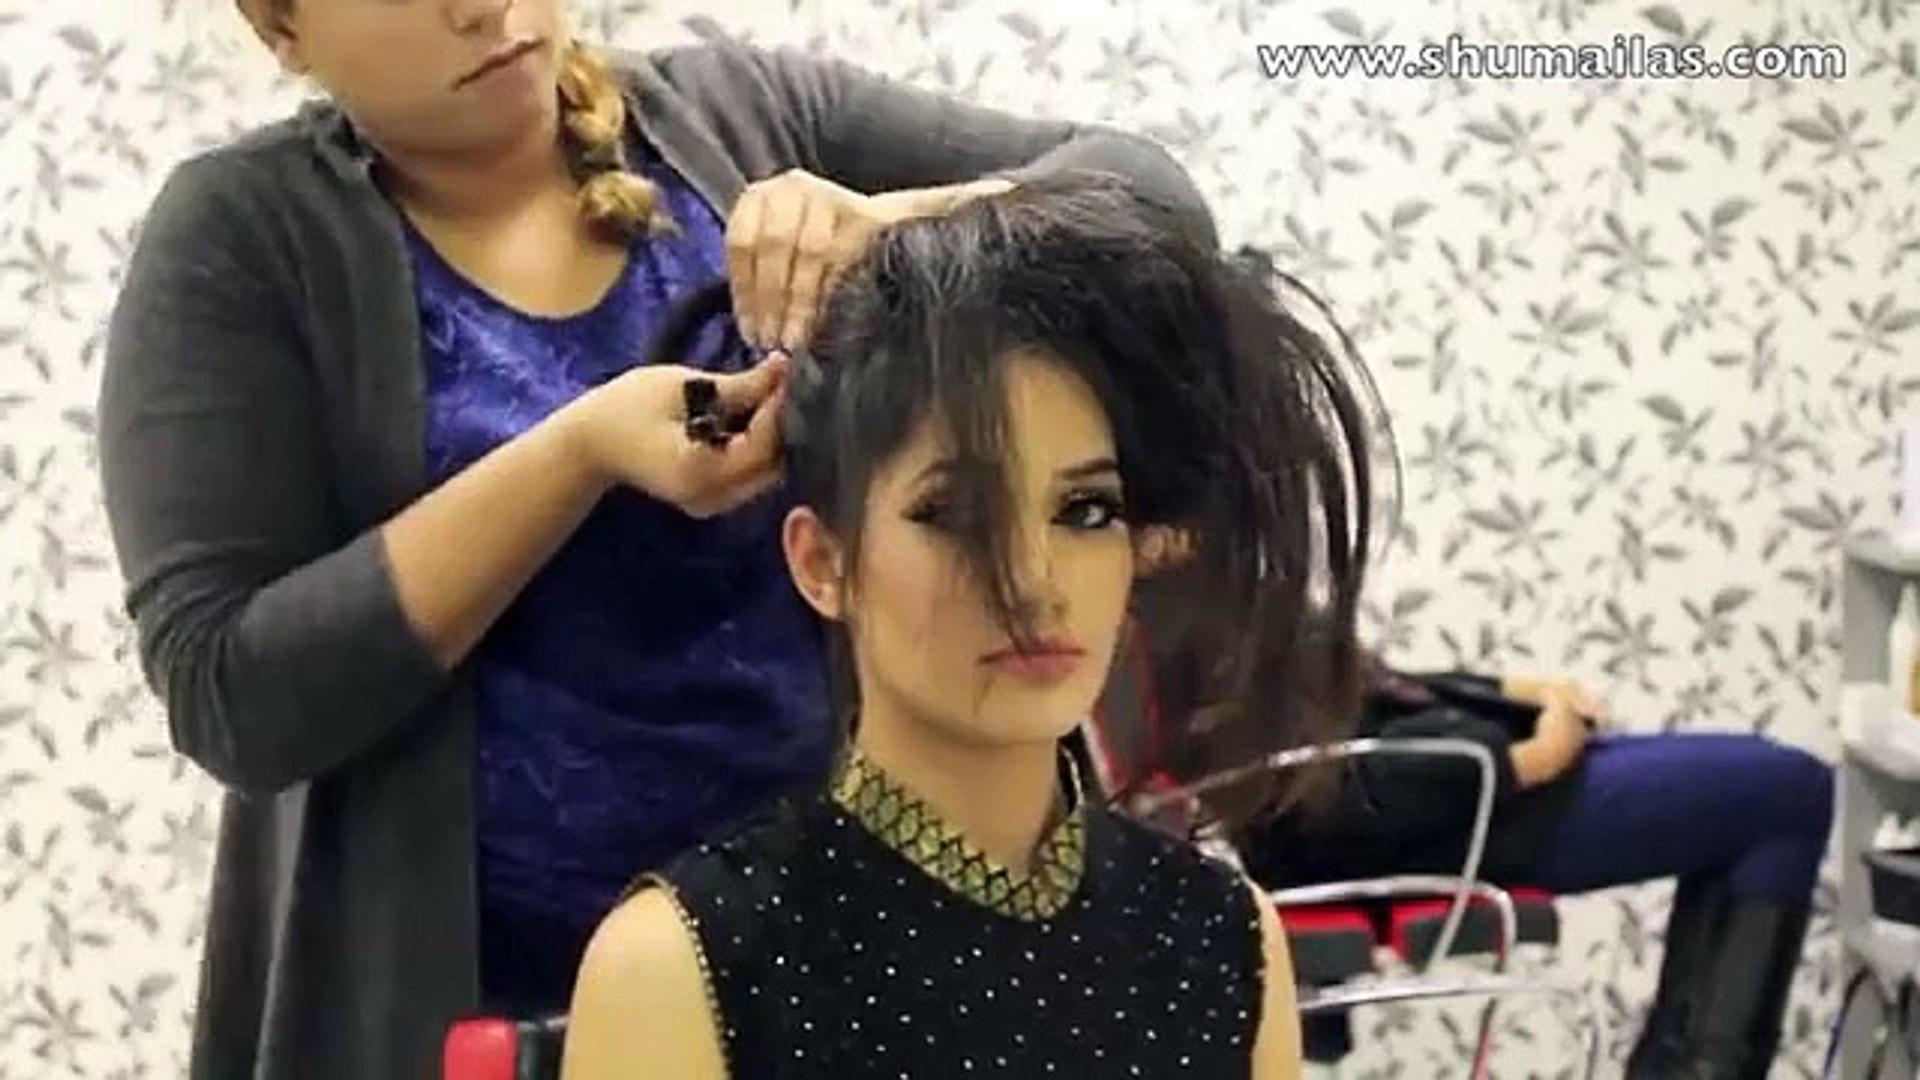 asian bridal hairstyles - pakistani_indian wedding hair style_updo bun using doughnut or donut